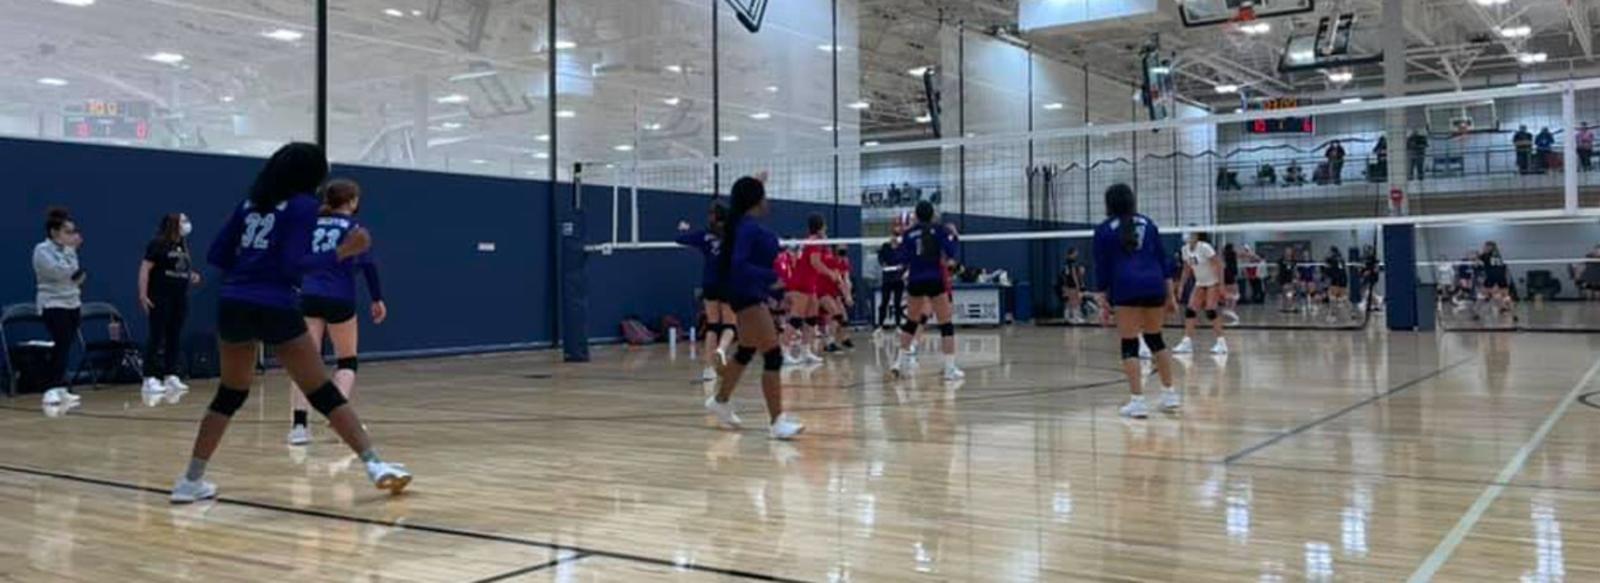 Volleyball at Hammond Sportsplex